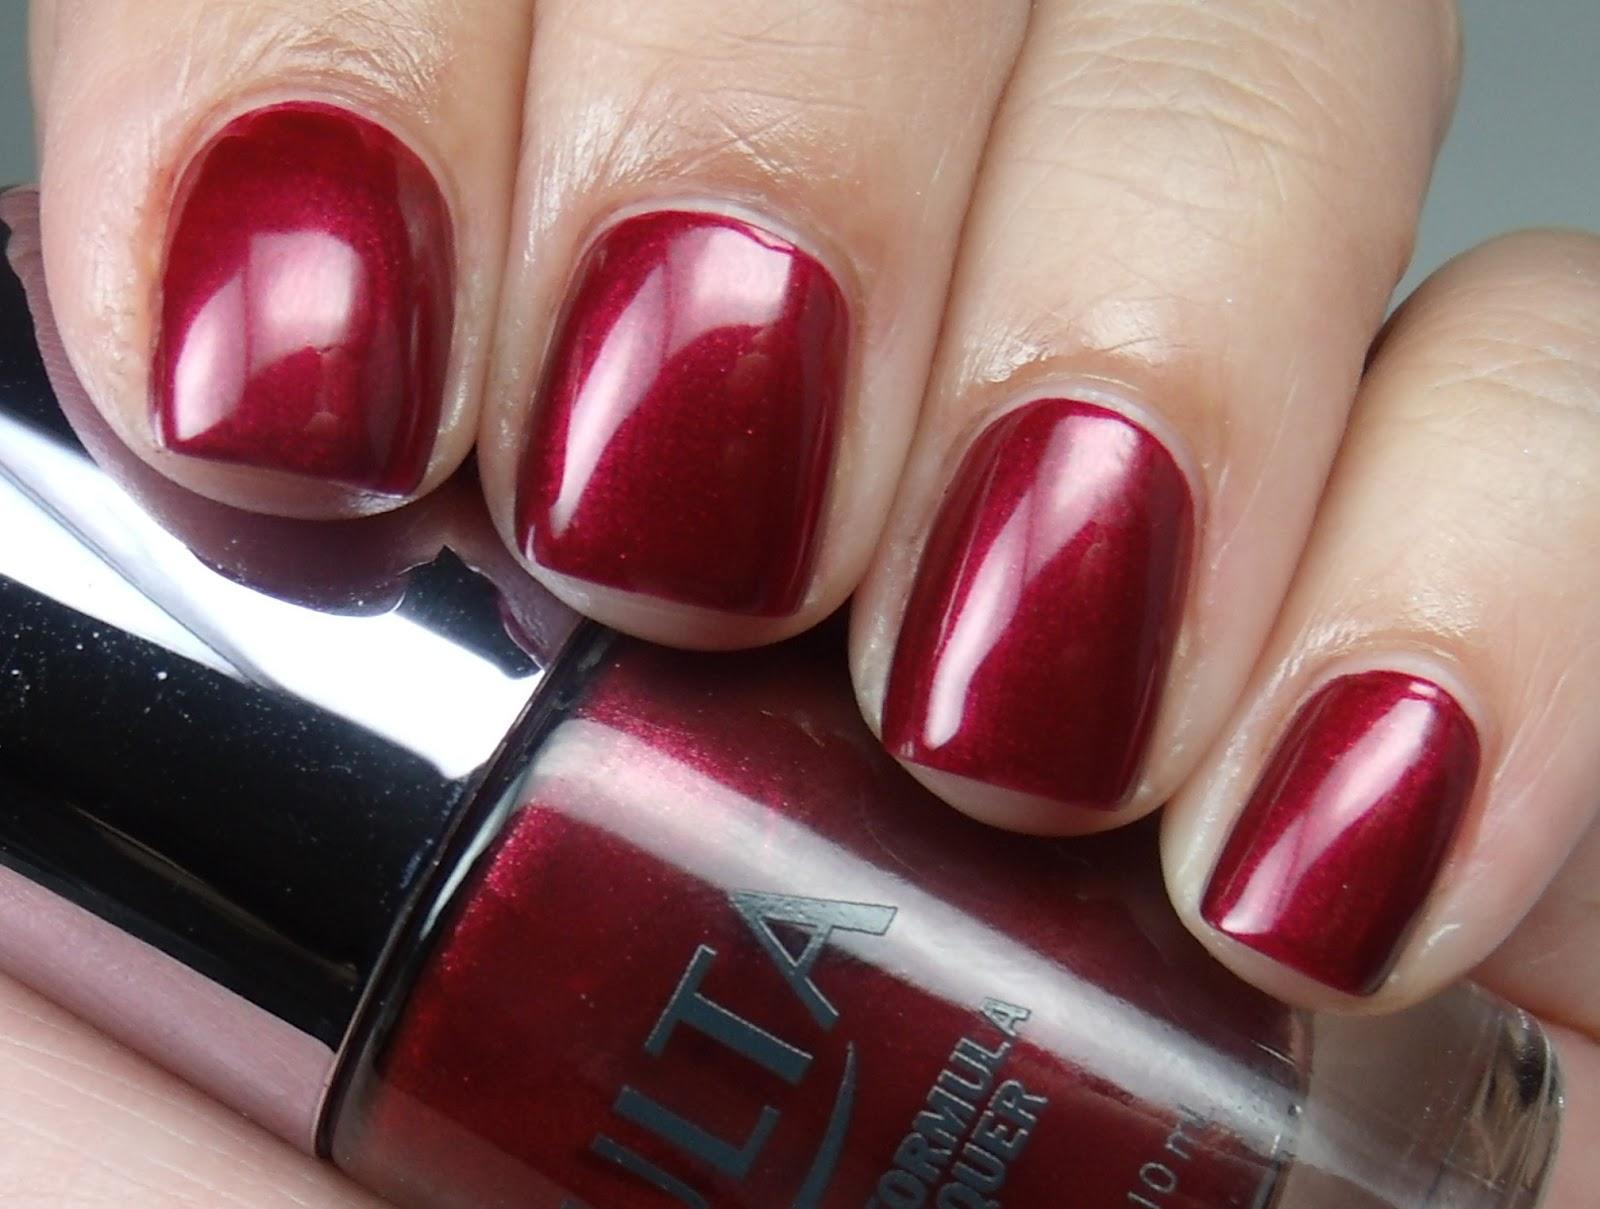 Colores de Carol: ULTA - Ruby Slippers